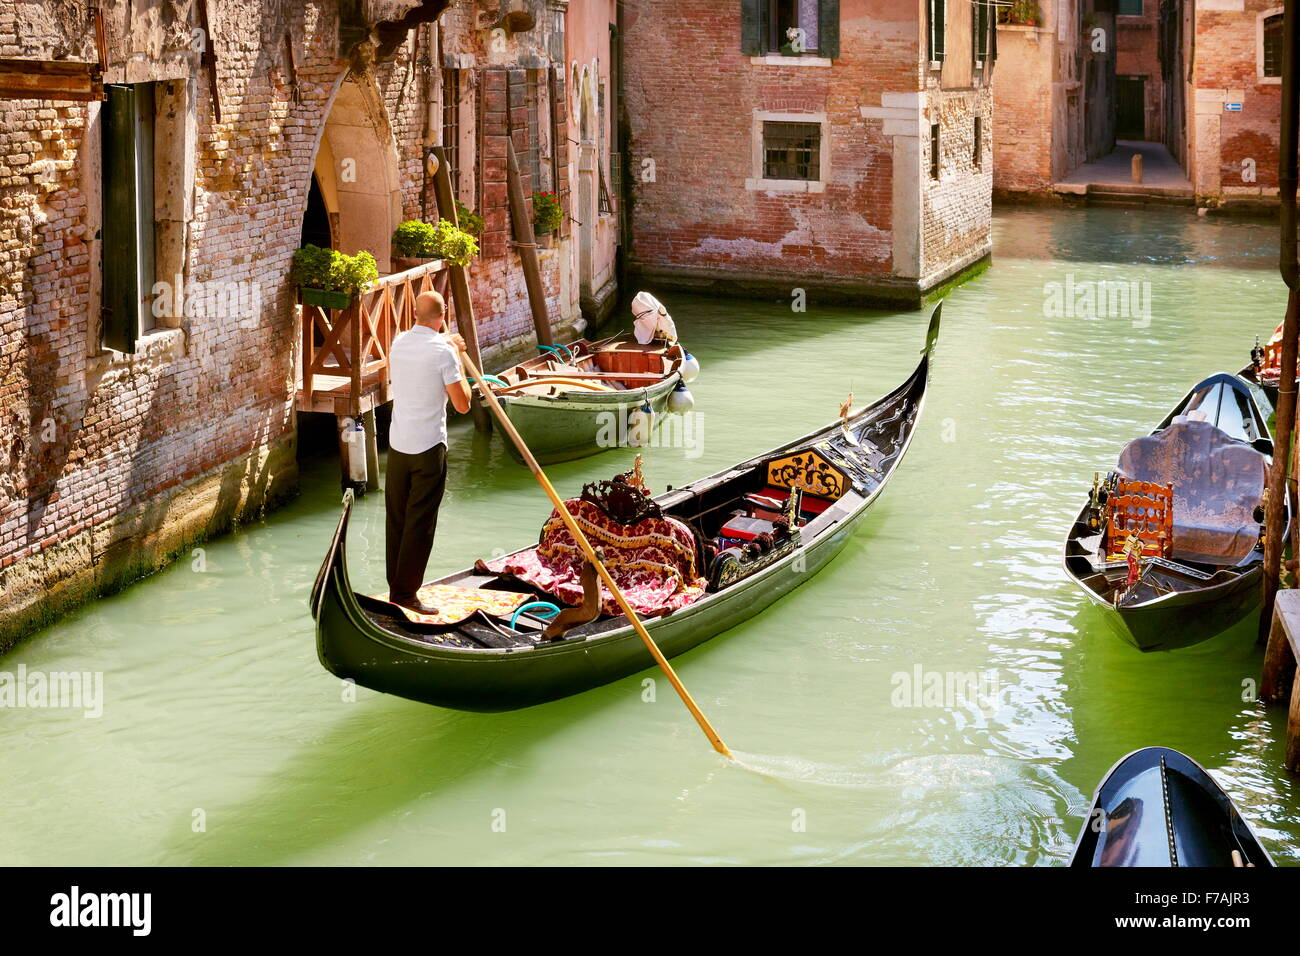 Gondolier in his gondola on venetian canal, Venice, Veneto, Italy, UNESCO - Stock Image